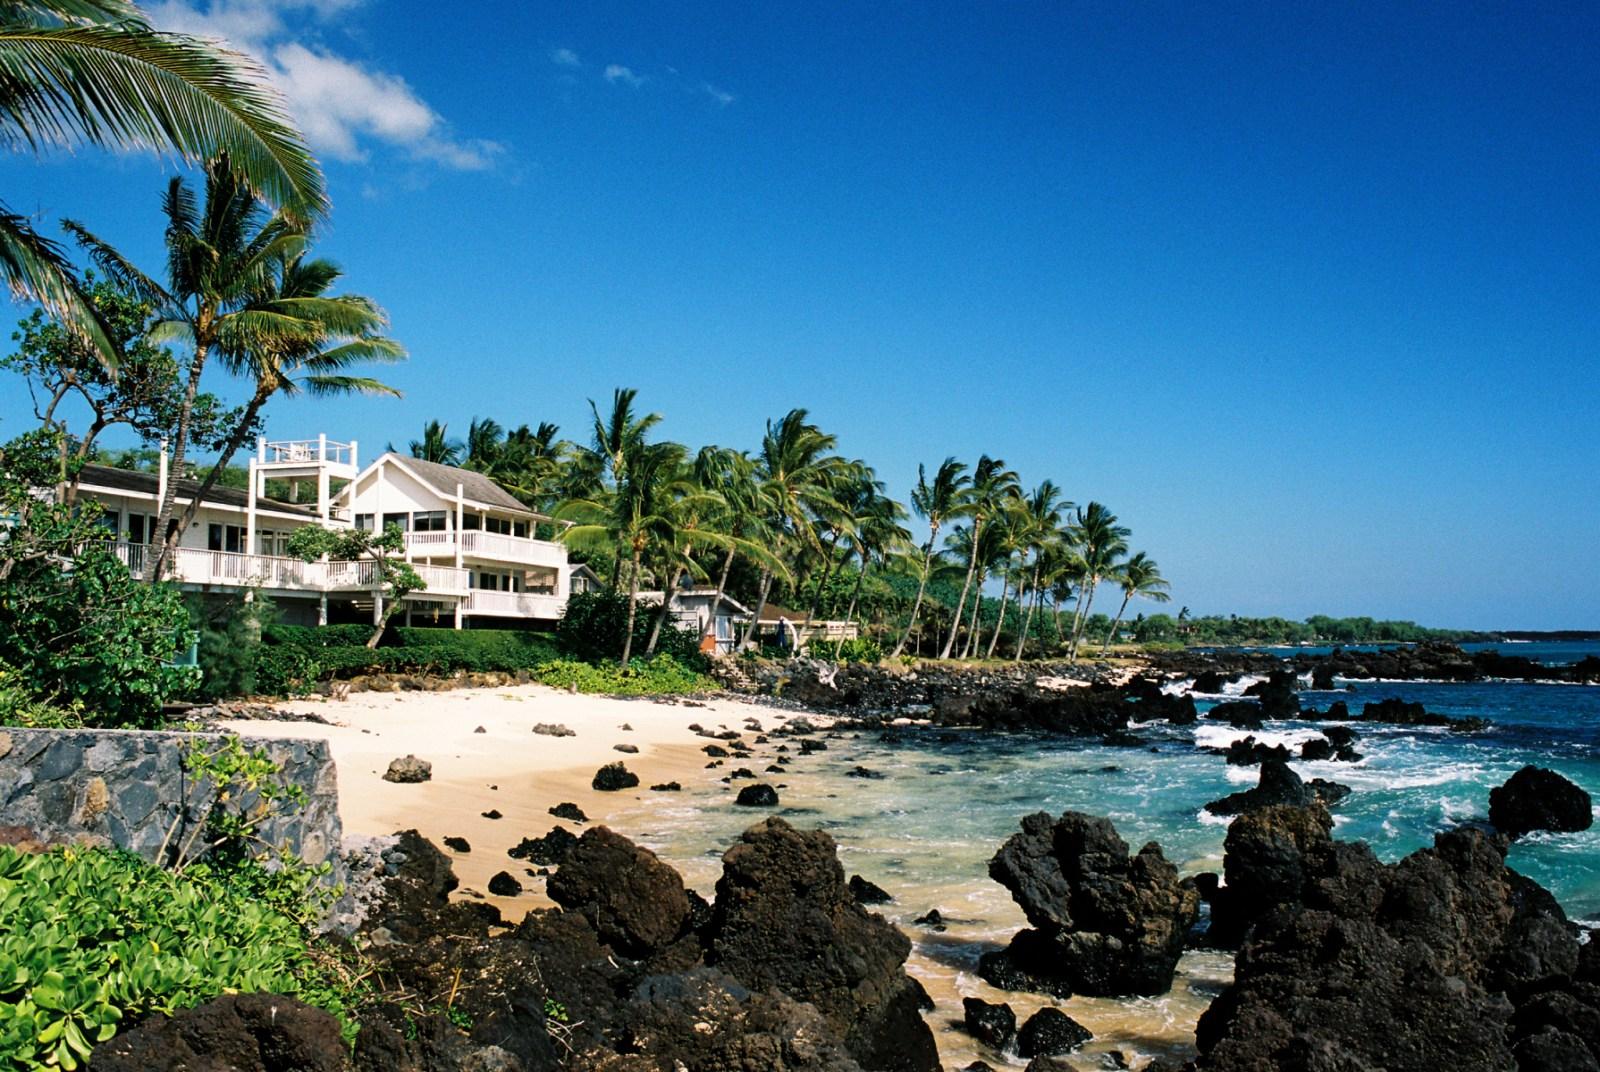 Oceanfront Vacation Rentals Beach House Rentals Condos Vacasa